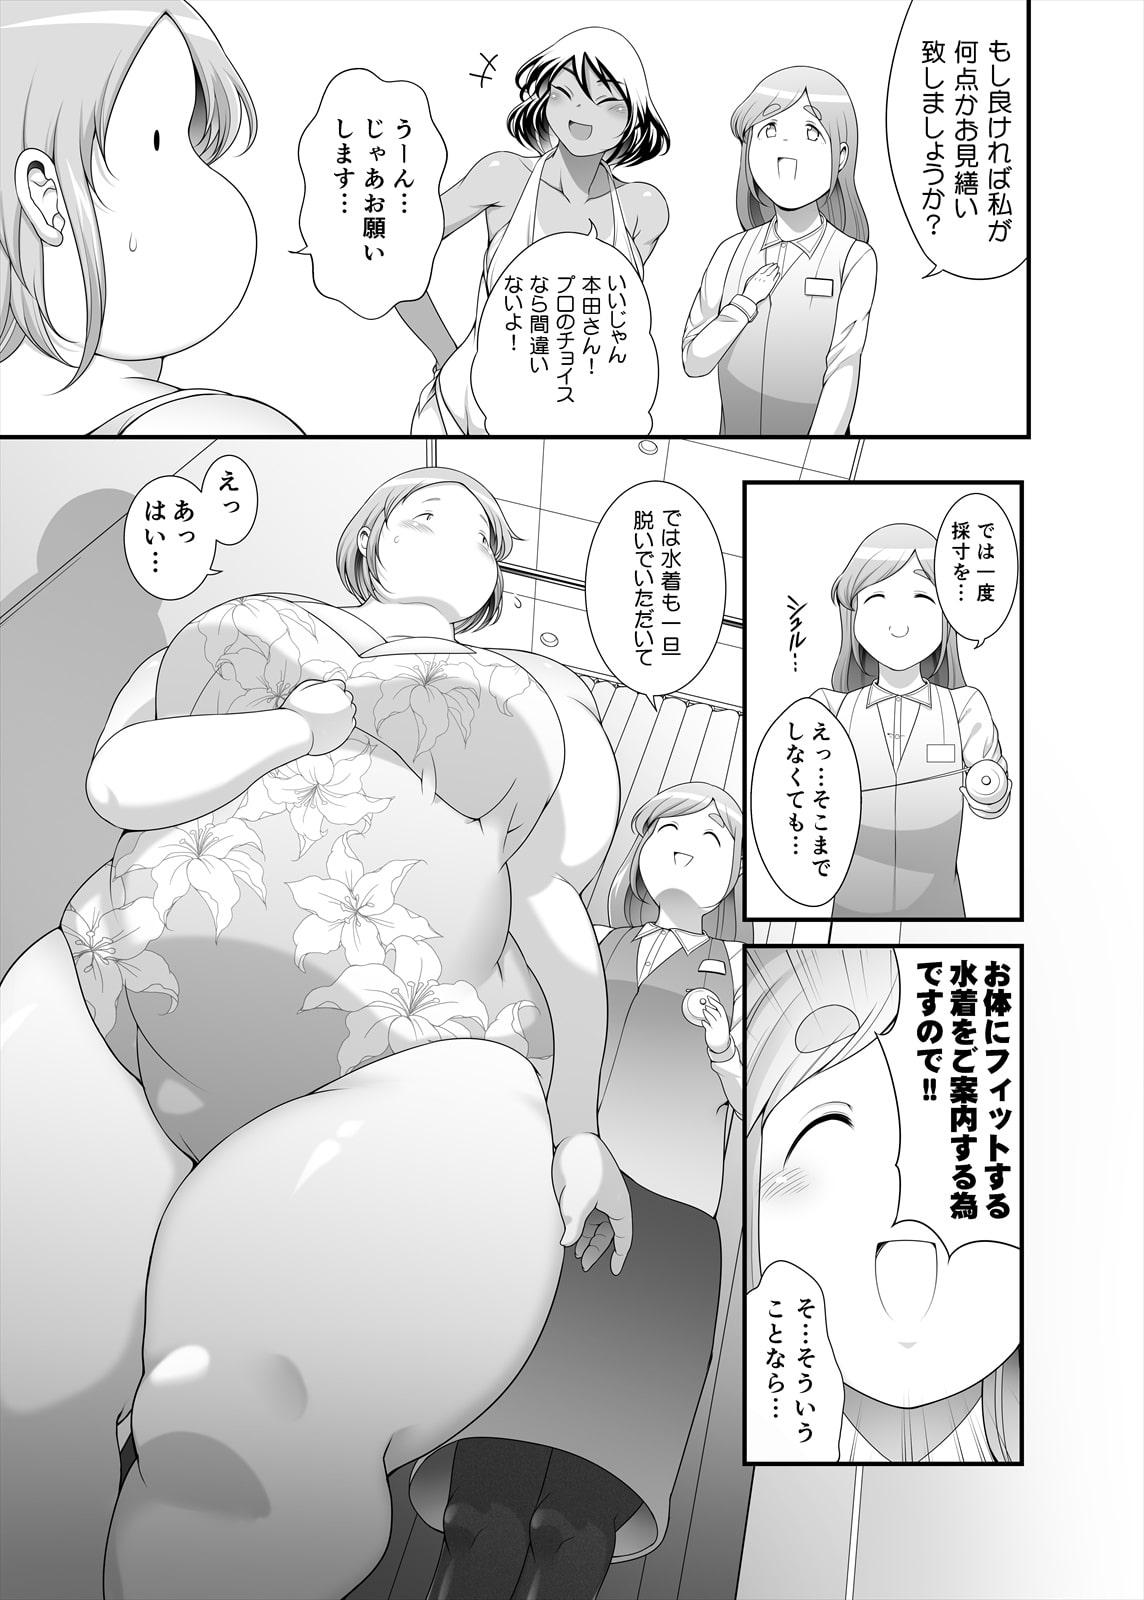 RJ321958 ぽちゃオナペット本田さん6 採寸編 [20210403]